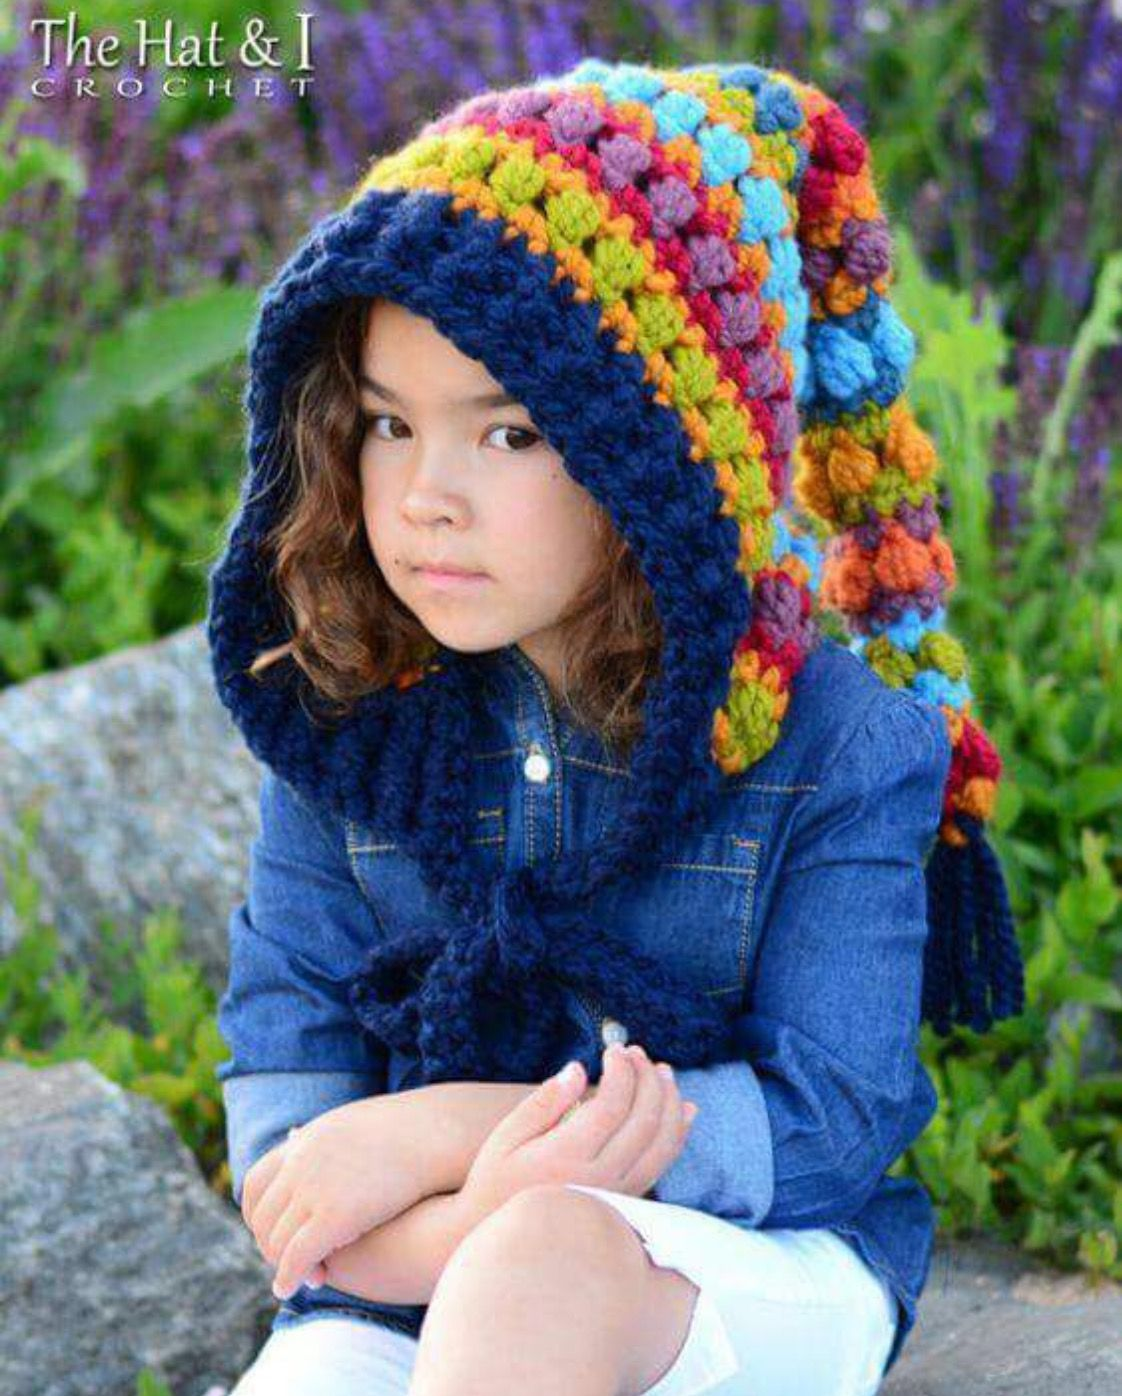 Pin de misu en BABY HAT 7 | Pinterest | Gorros